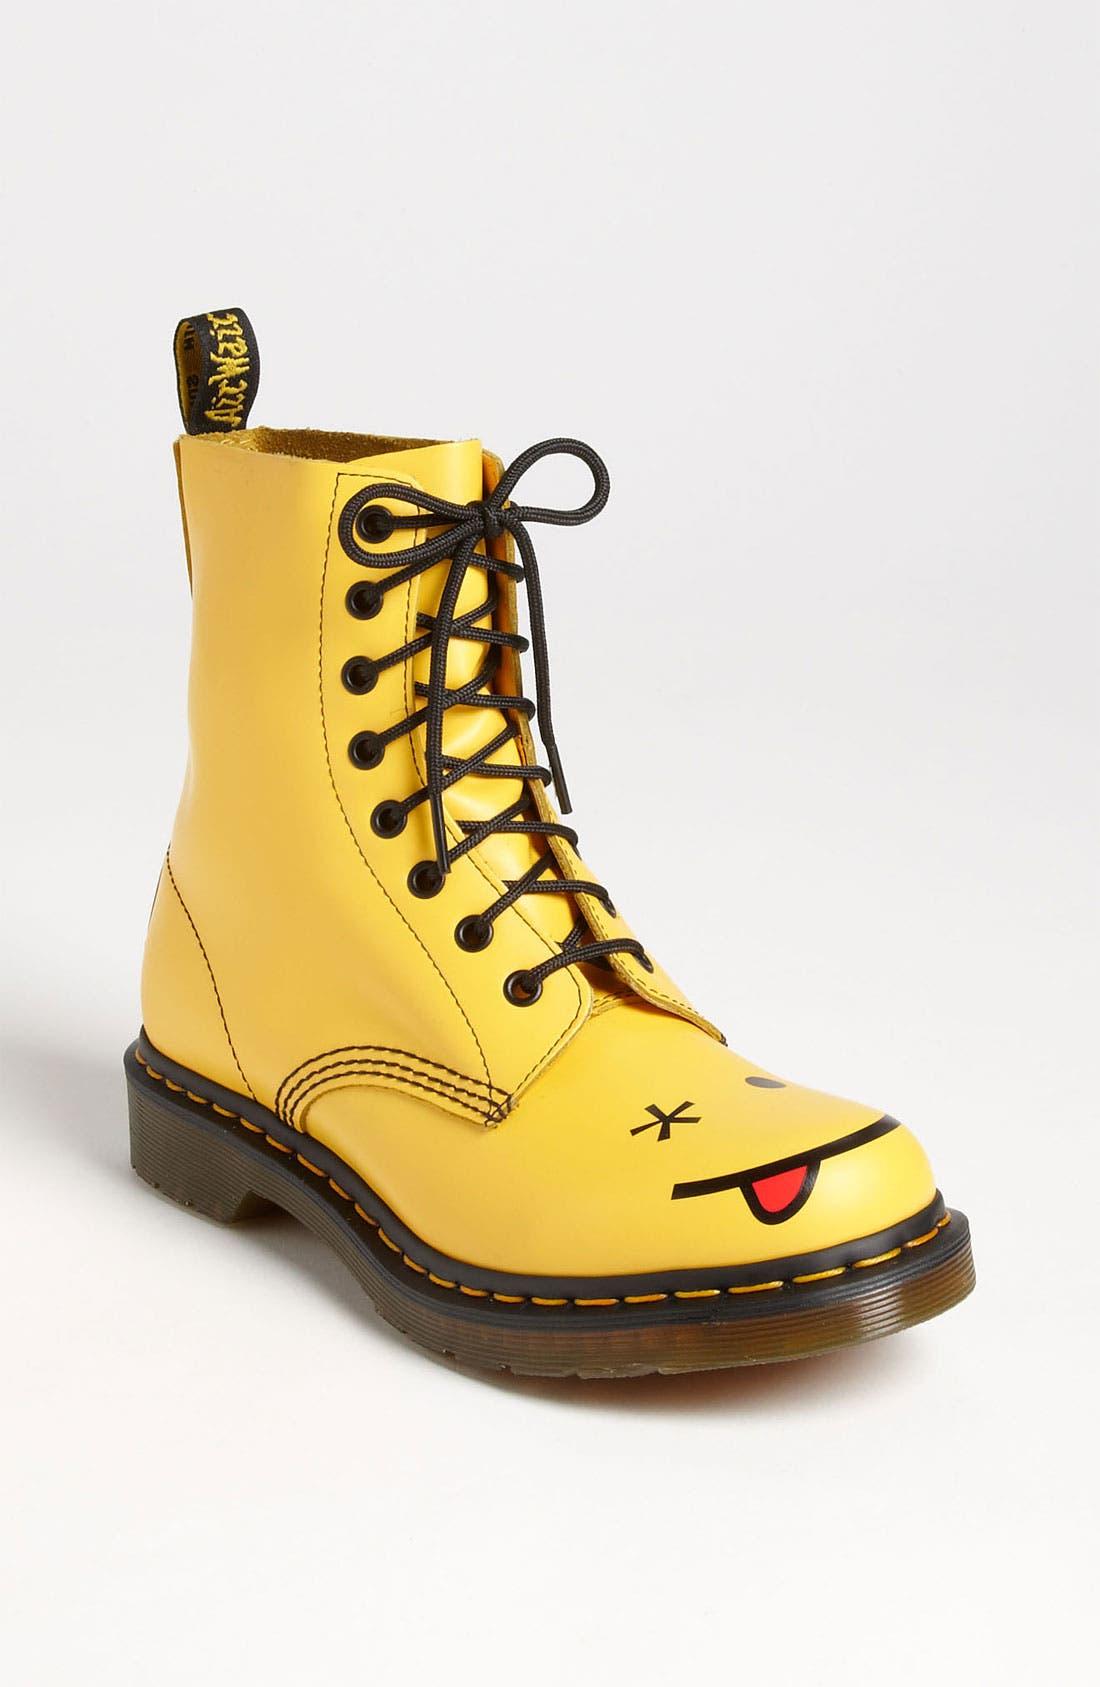 Alternate Image 1 Selected - Dr. Martens 'Hincky' Boot (Women)